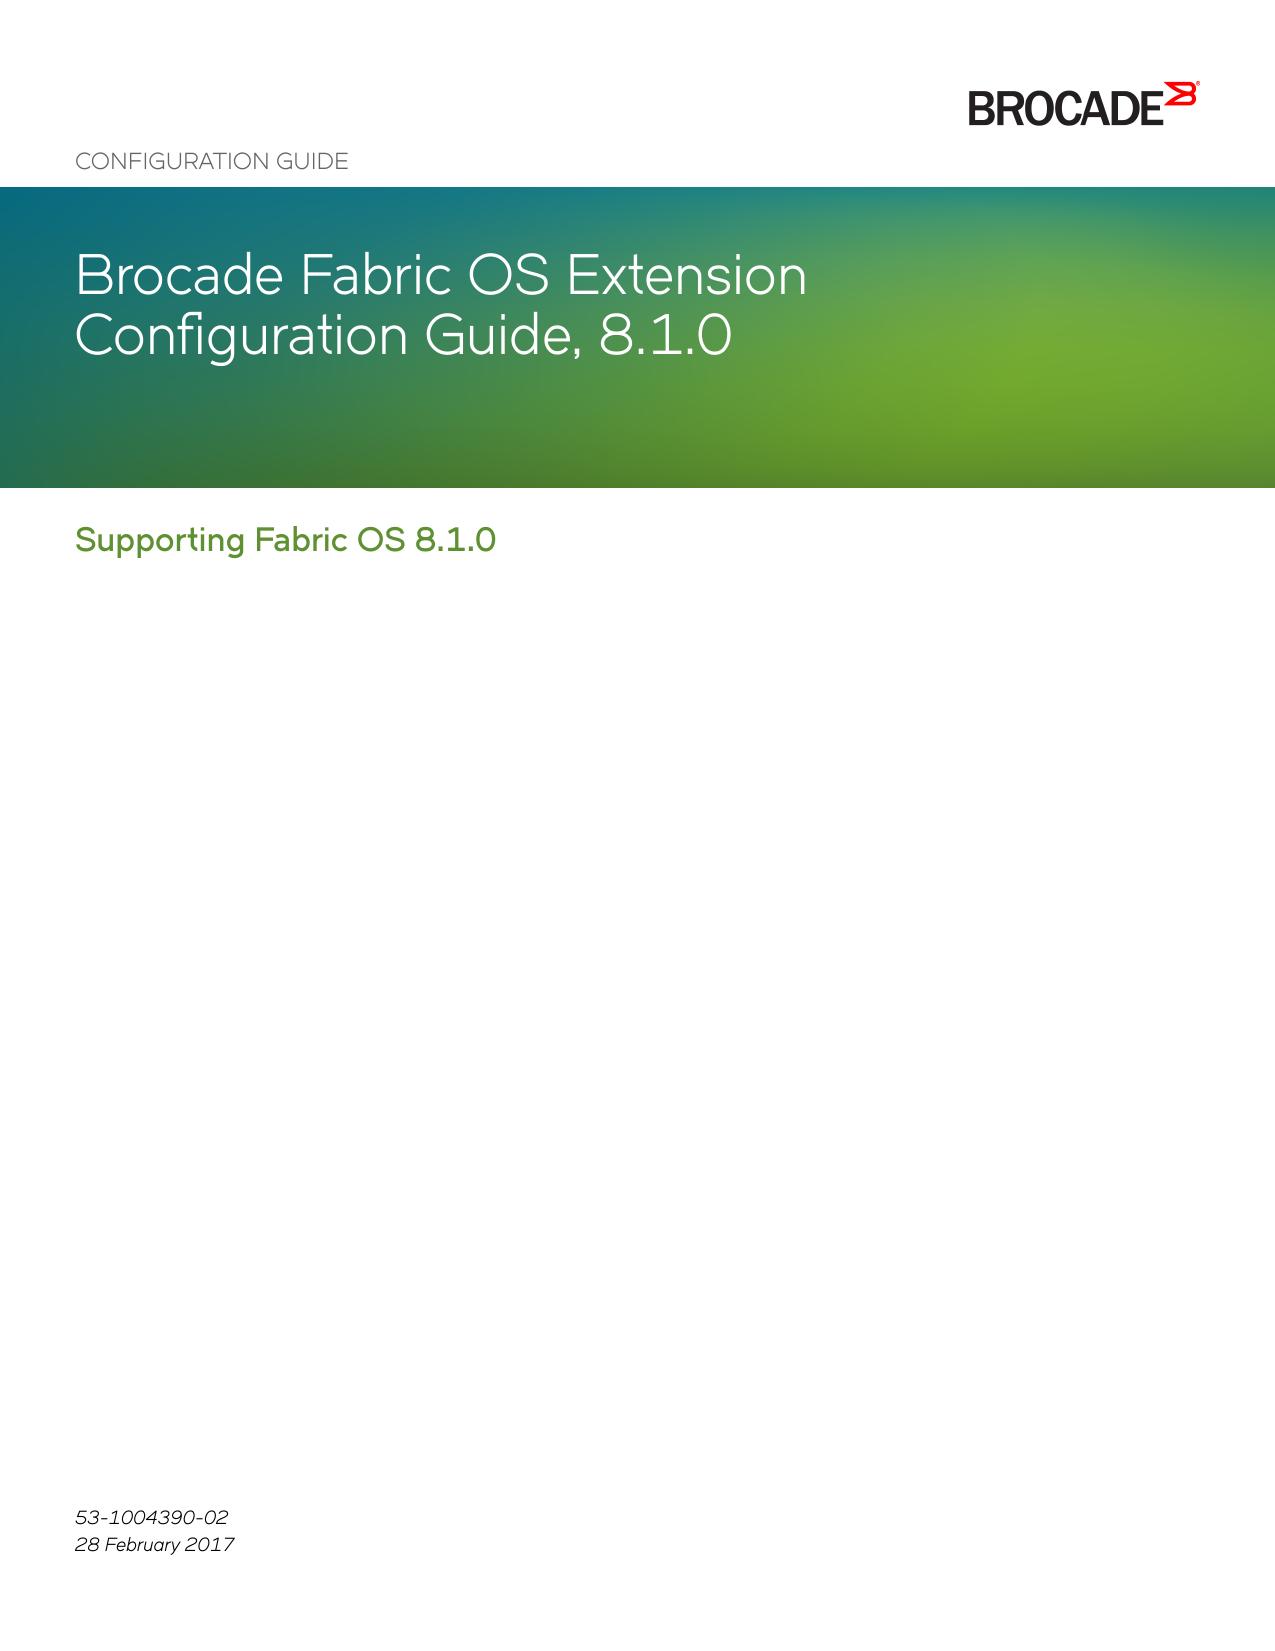 Brocade Fabric OS Extension Configuration Guide, 8 1 0